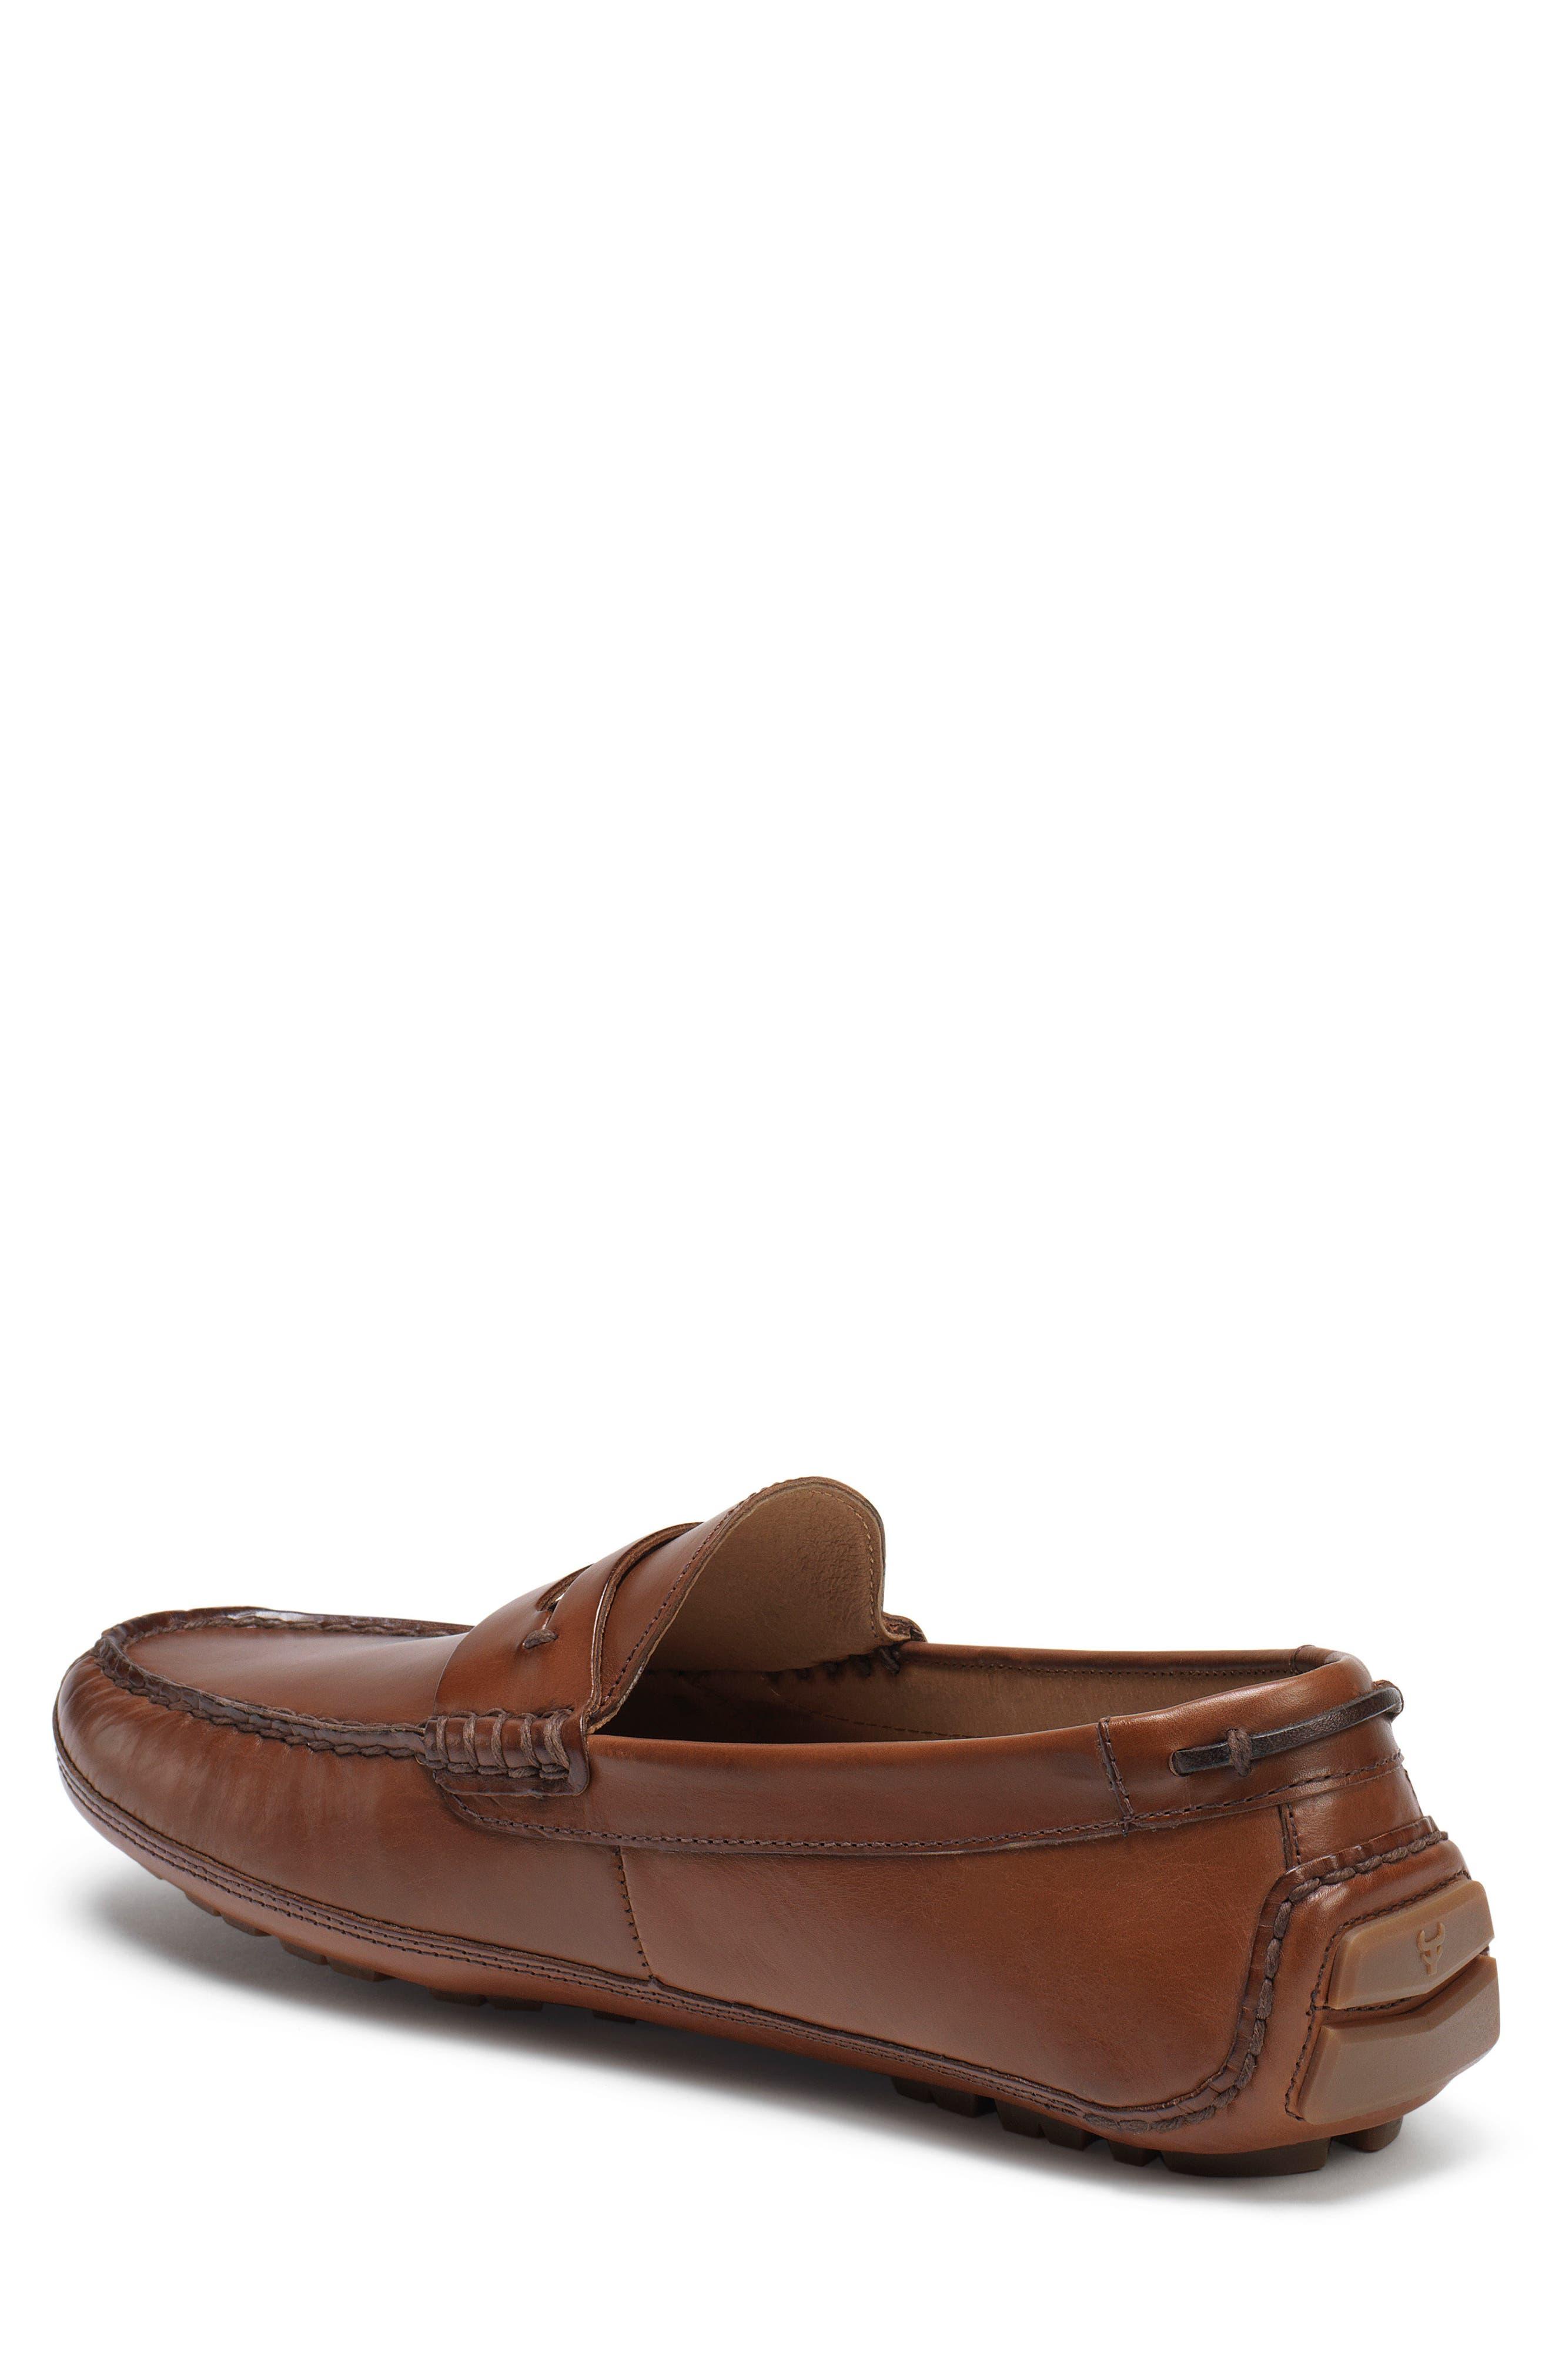 Alternate Image 2  - Trask Dawson Water Resistant Driving Loafer (Men)